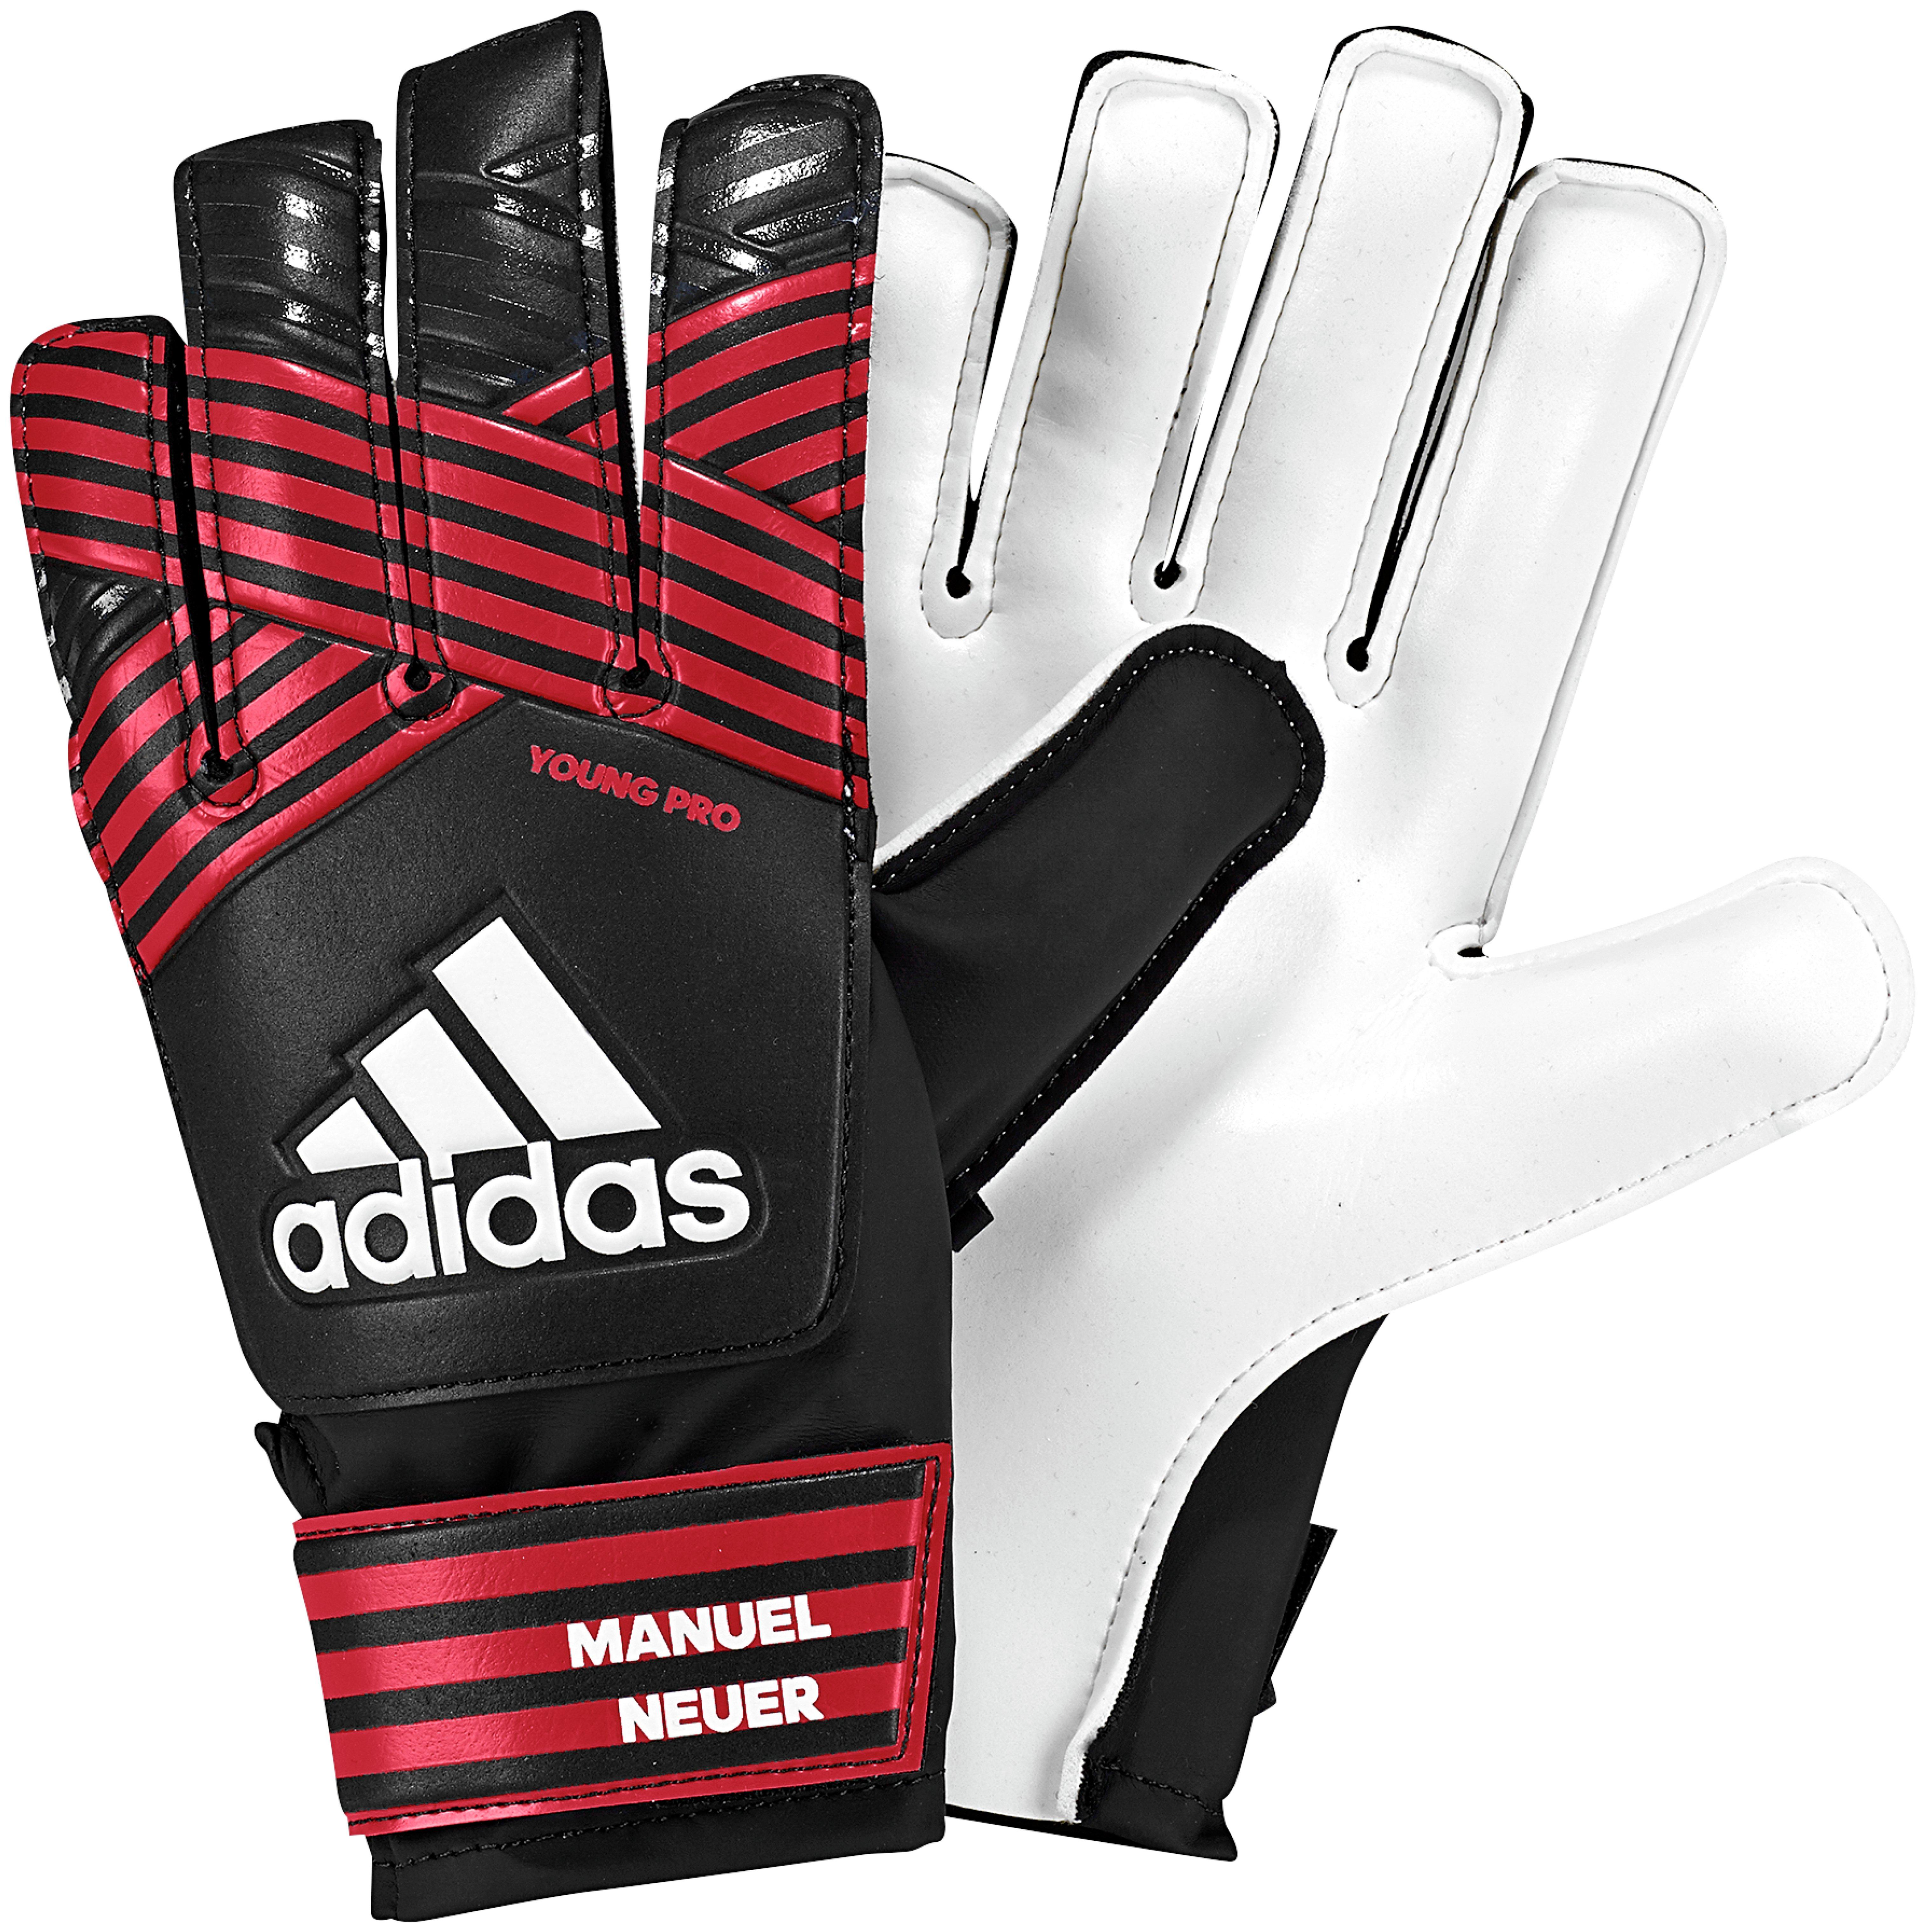 Adidas Ace Football Gooalkeeper Gloves